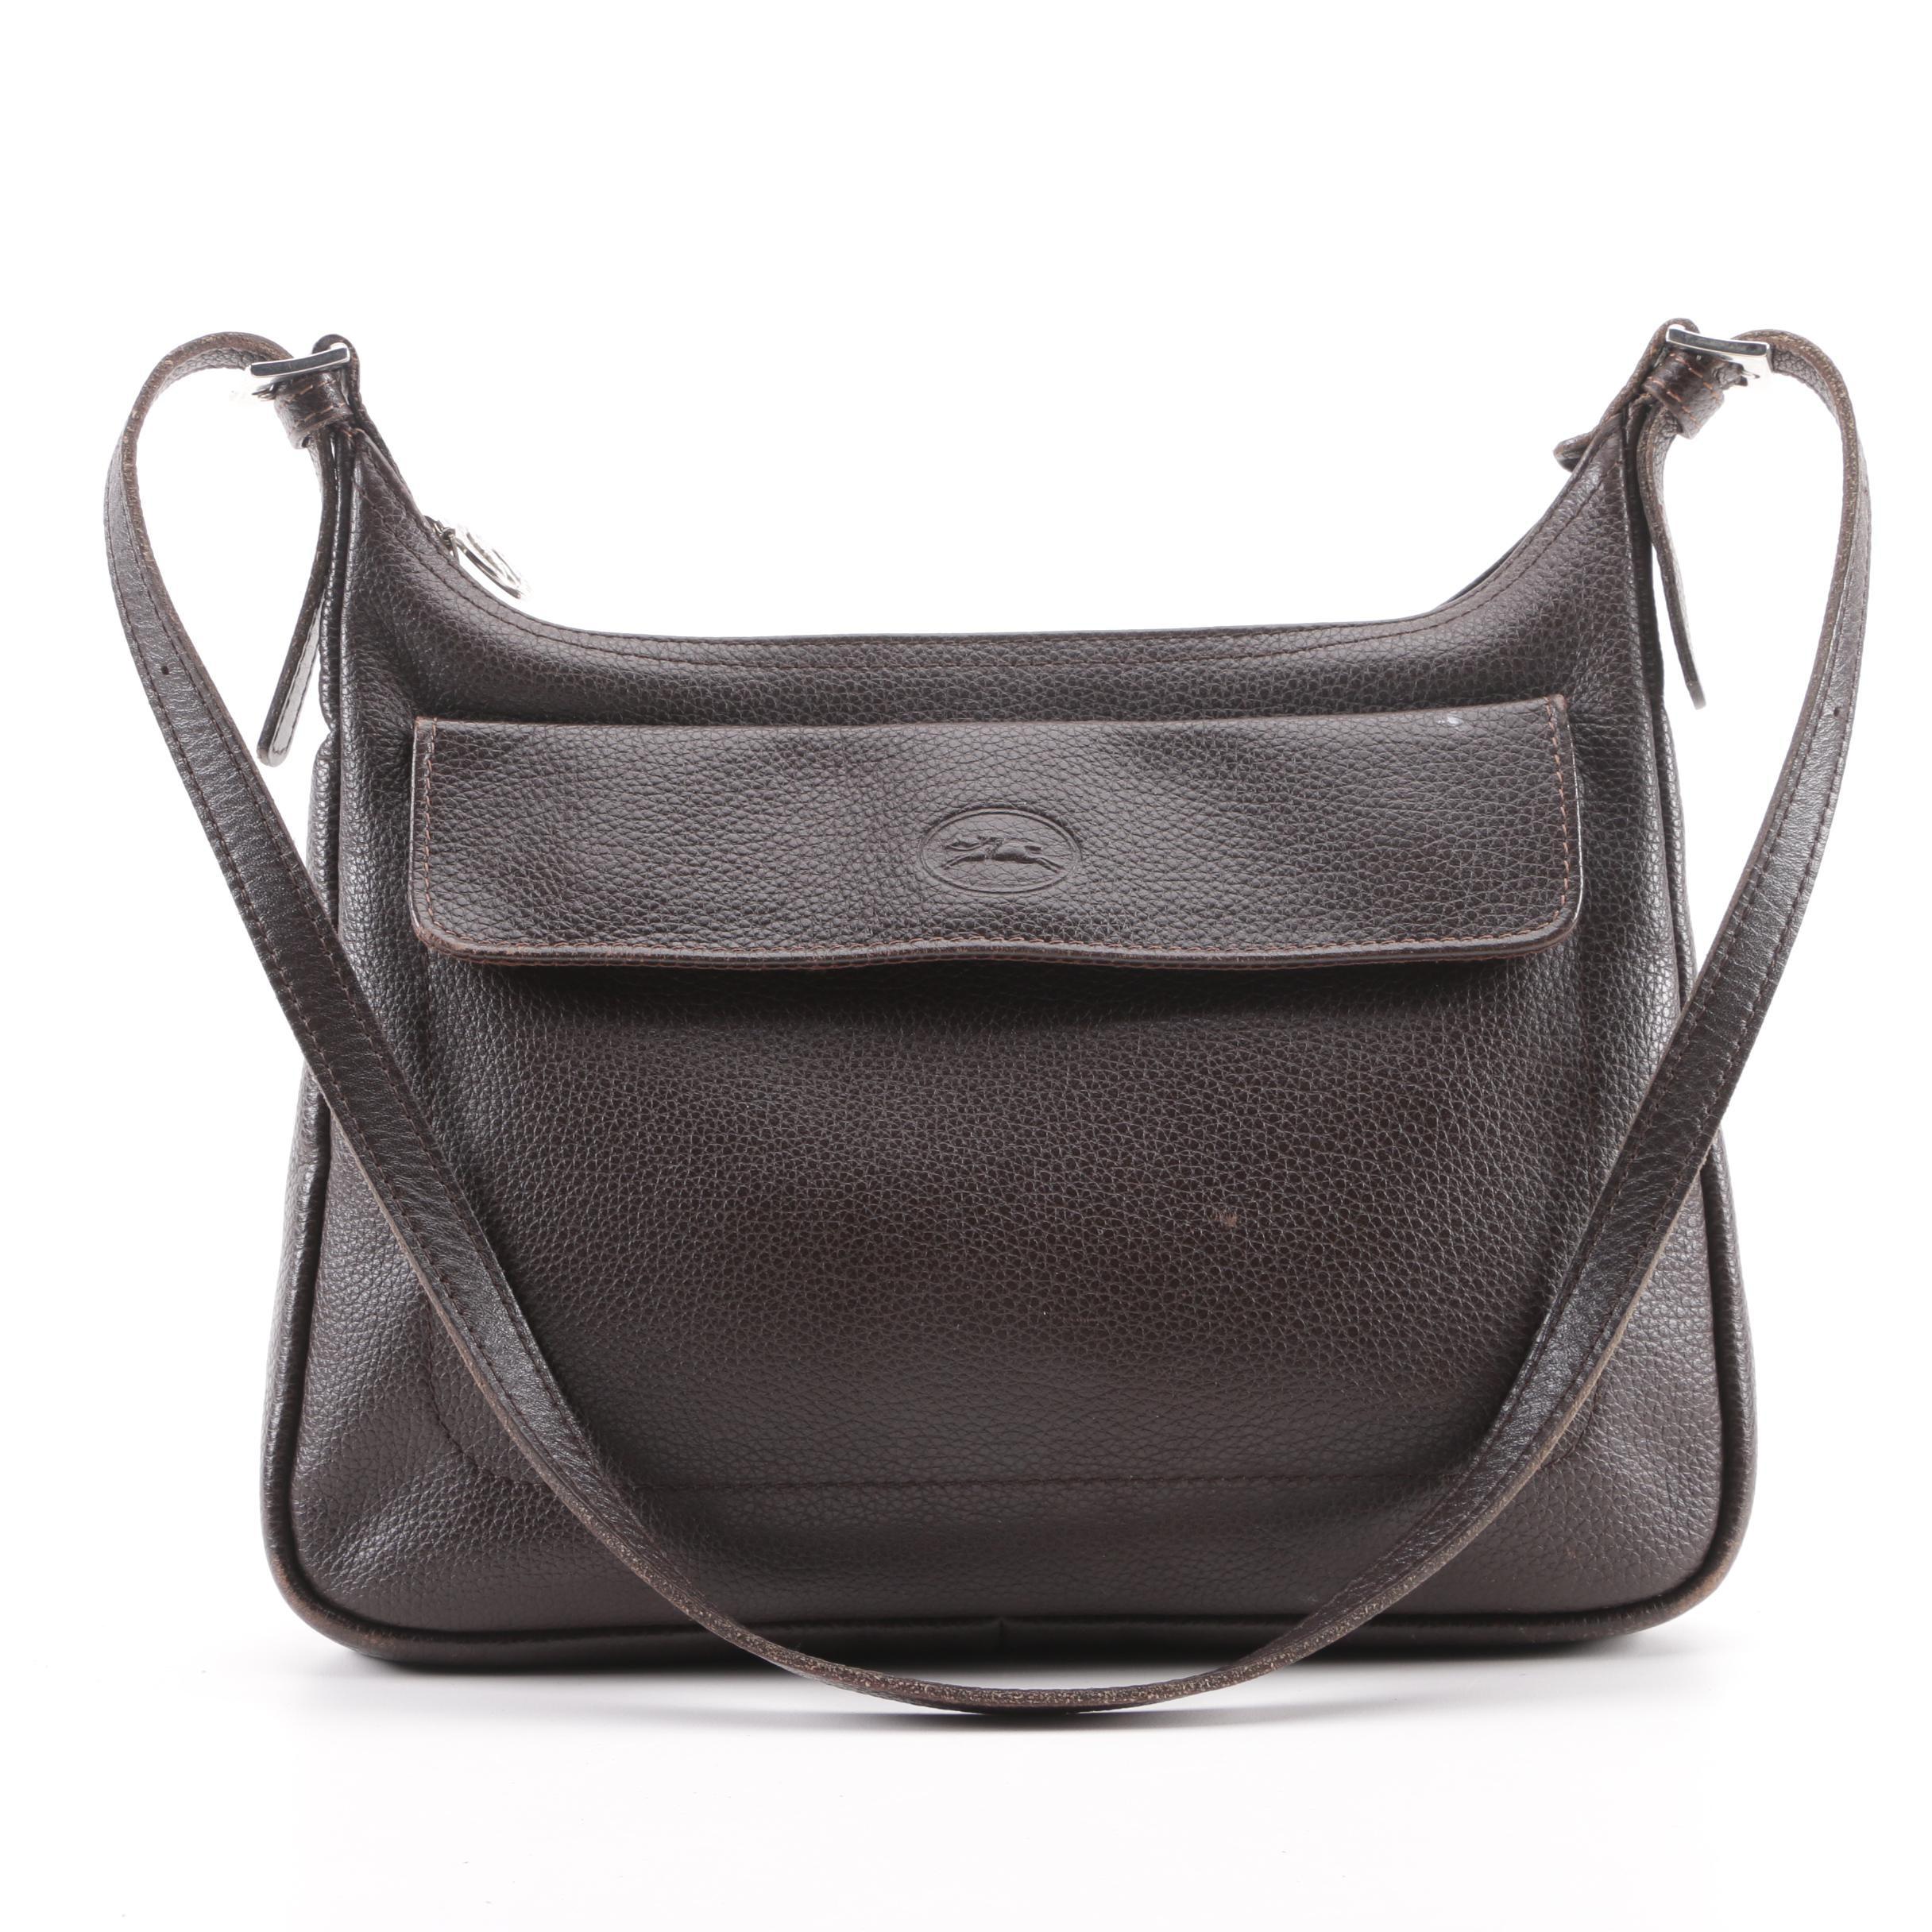 Longchamp Paris Brown Pebbled Leather Shoulder Bag